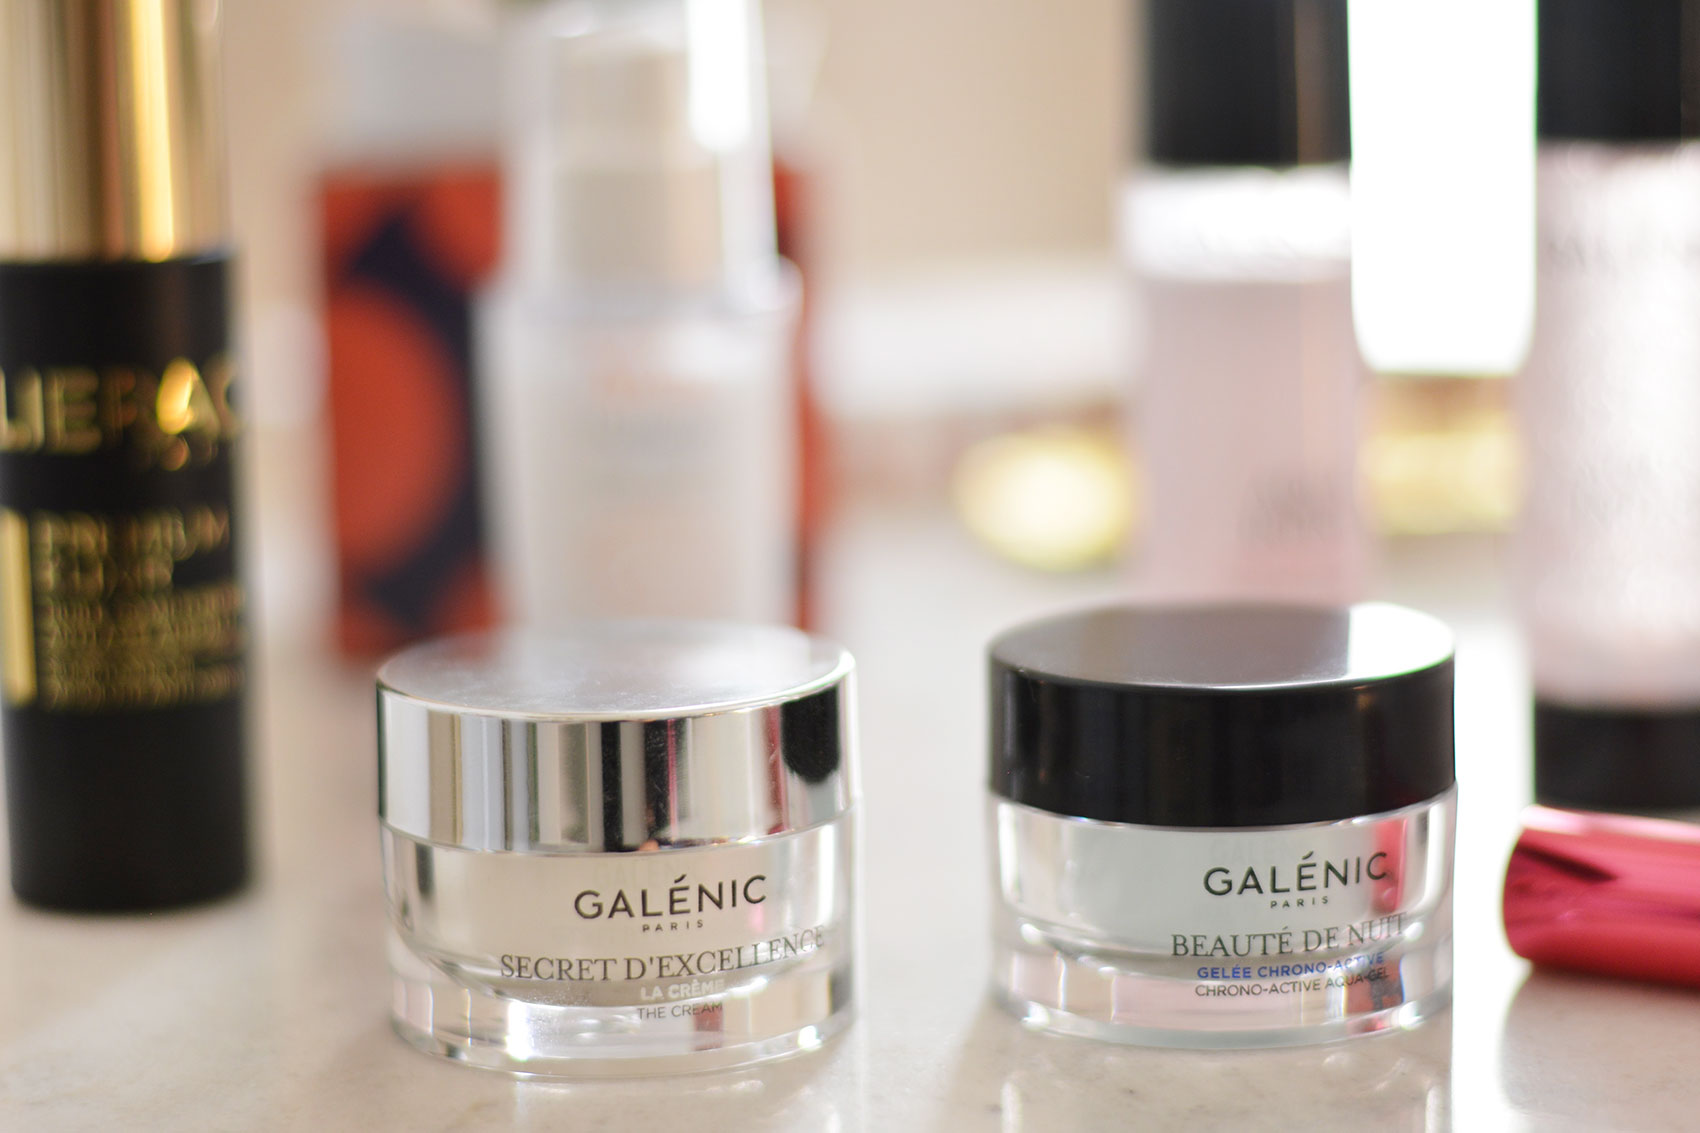 Quelques produits de la gamme Galenic